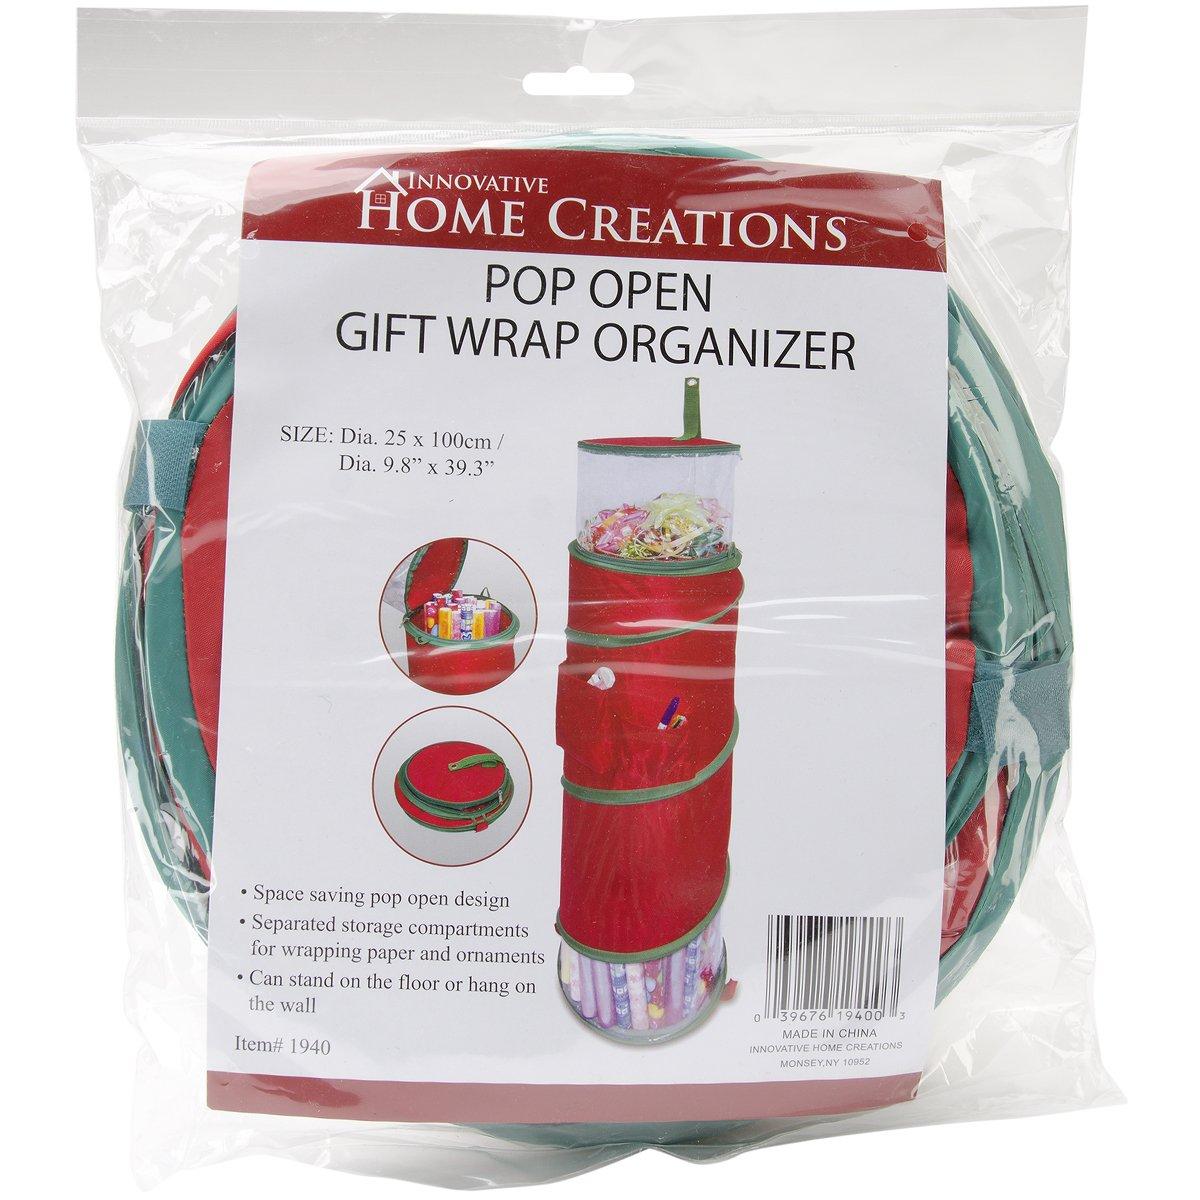 Amazon.com: Innovative Home Creations Pop-Open Christmas Gift Wrap ...